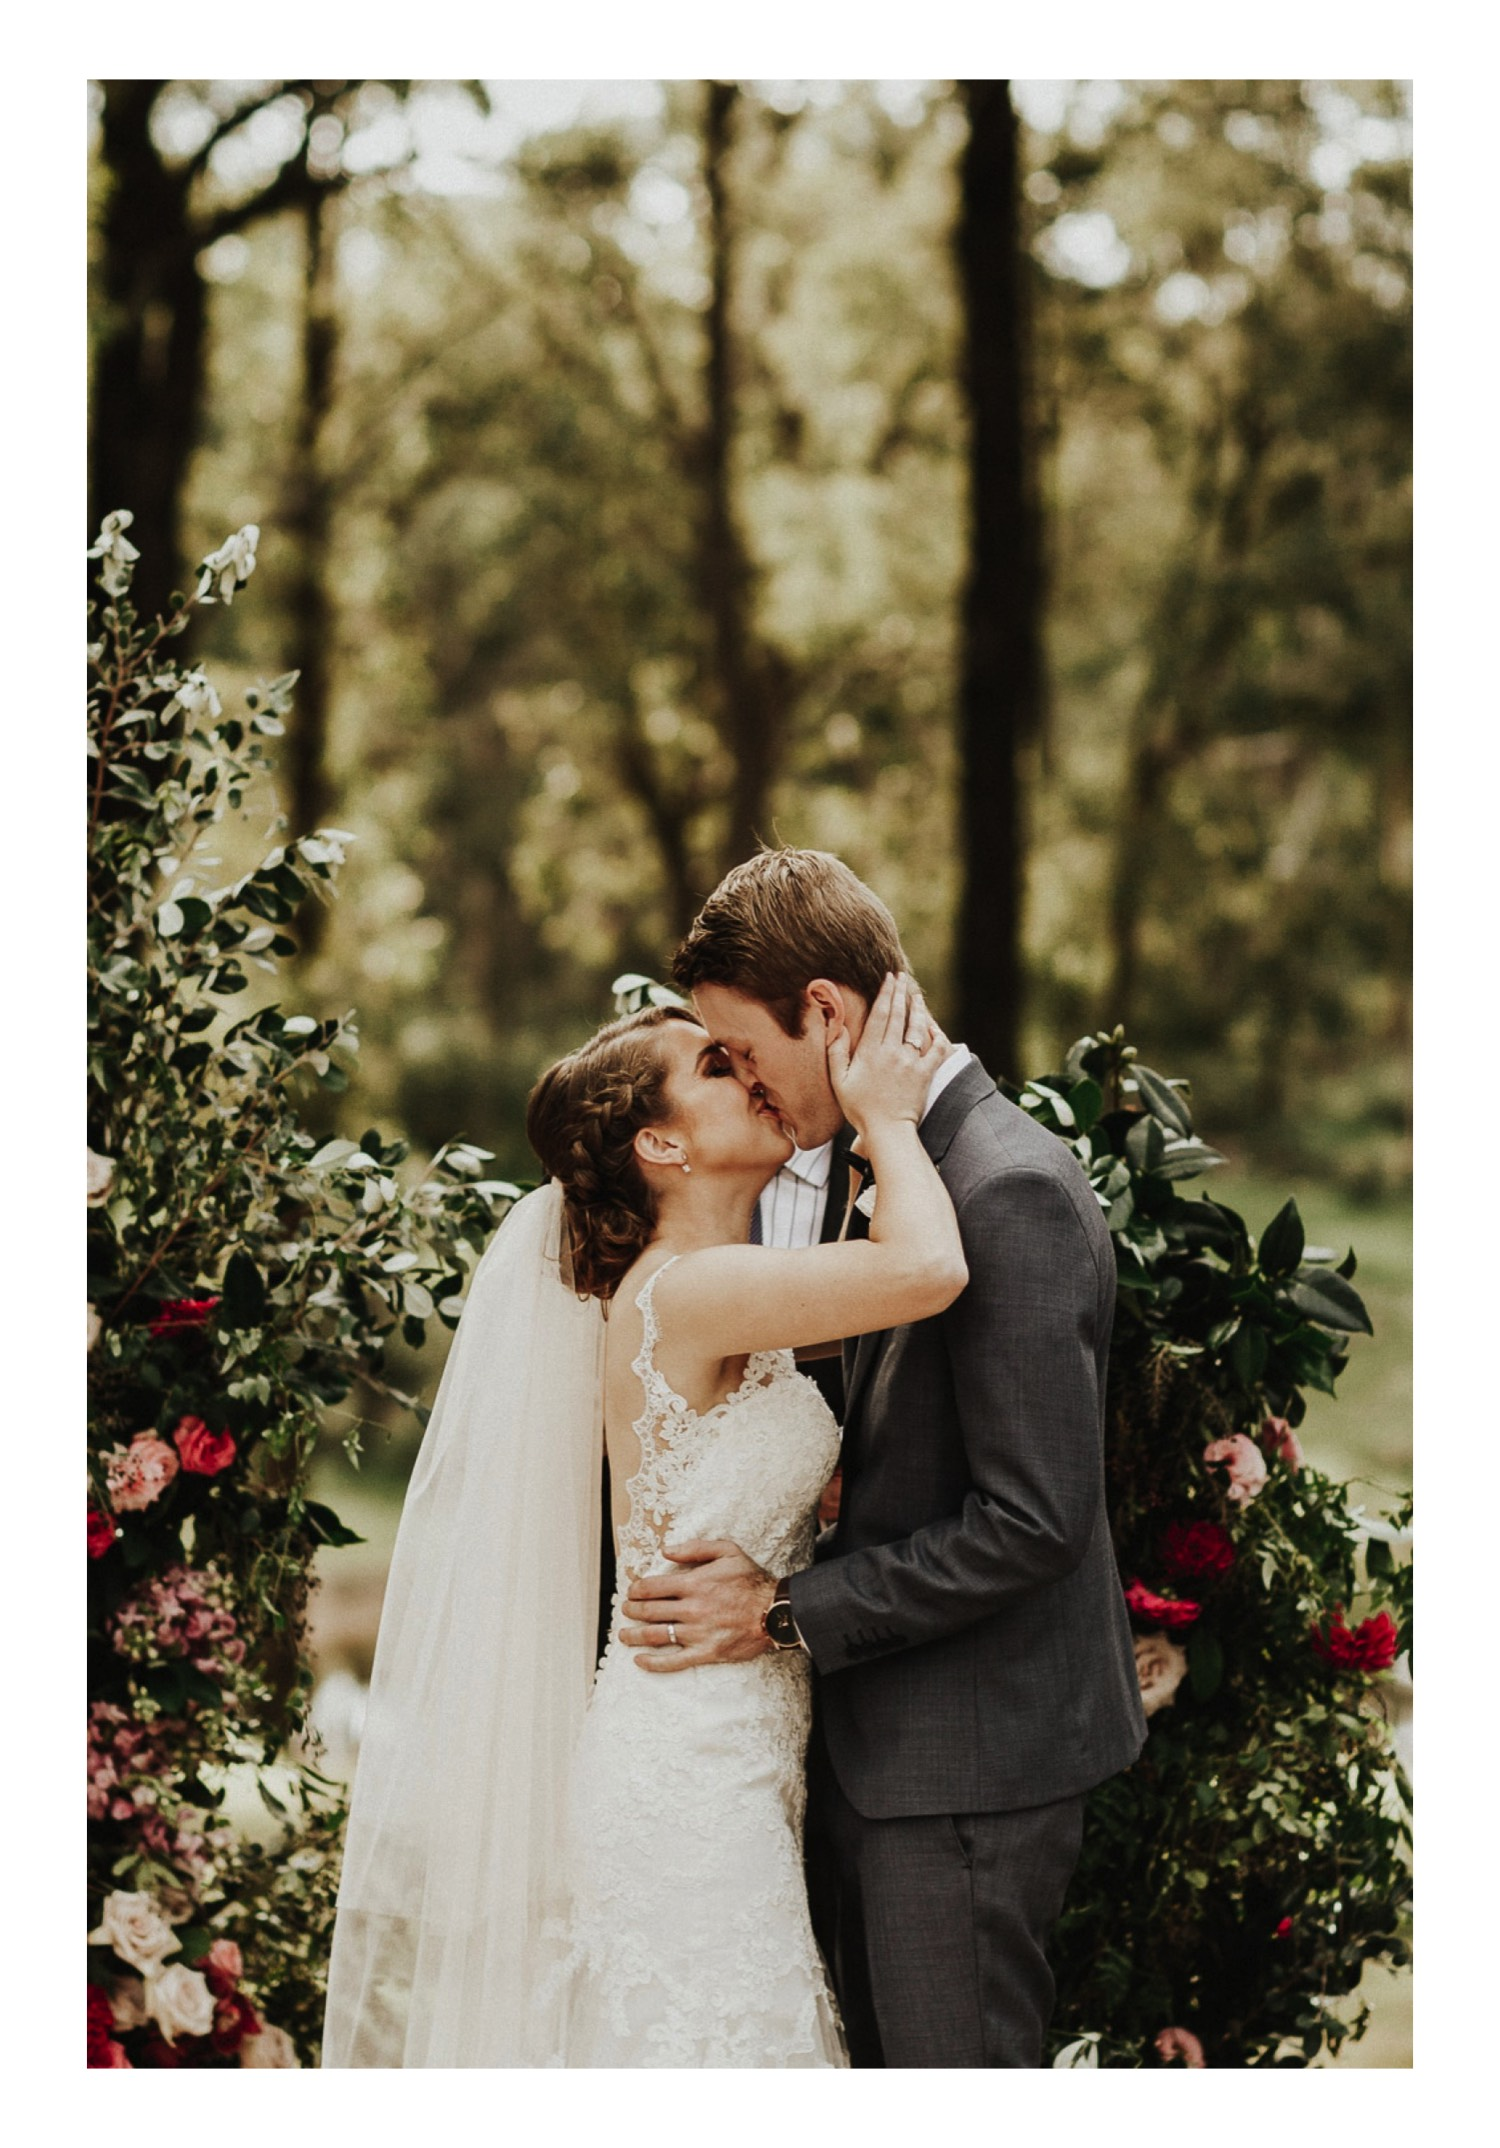 Rustic Country Wedding Photography 37.jpg